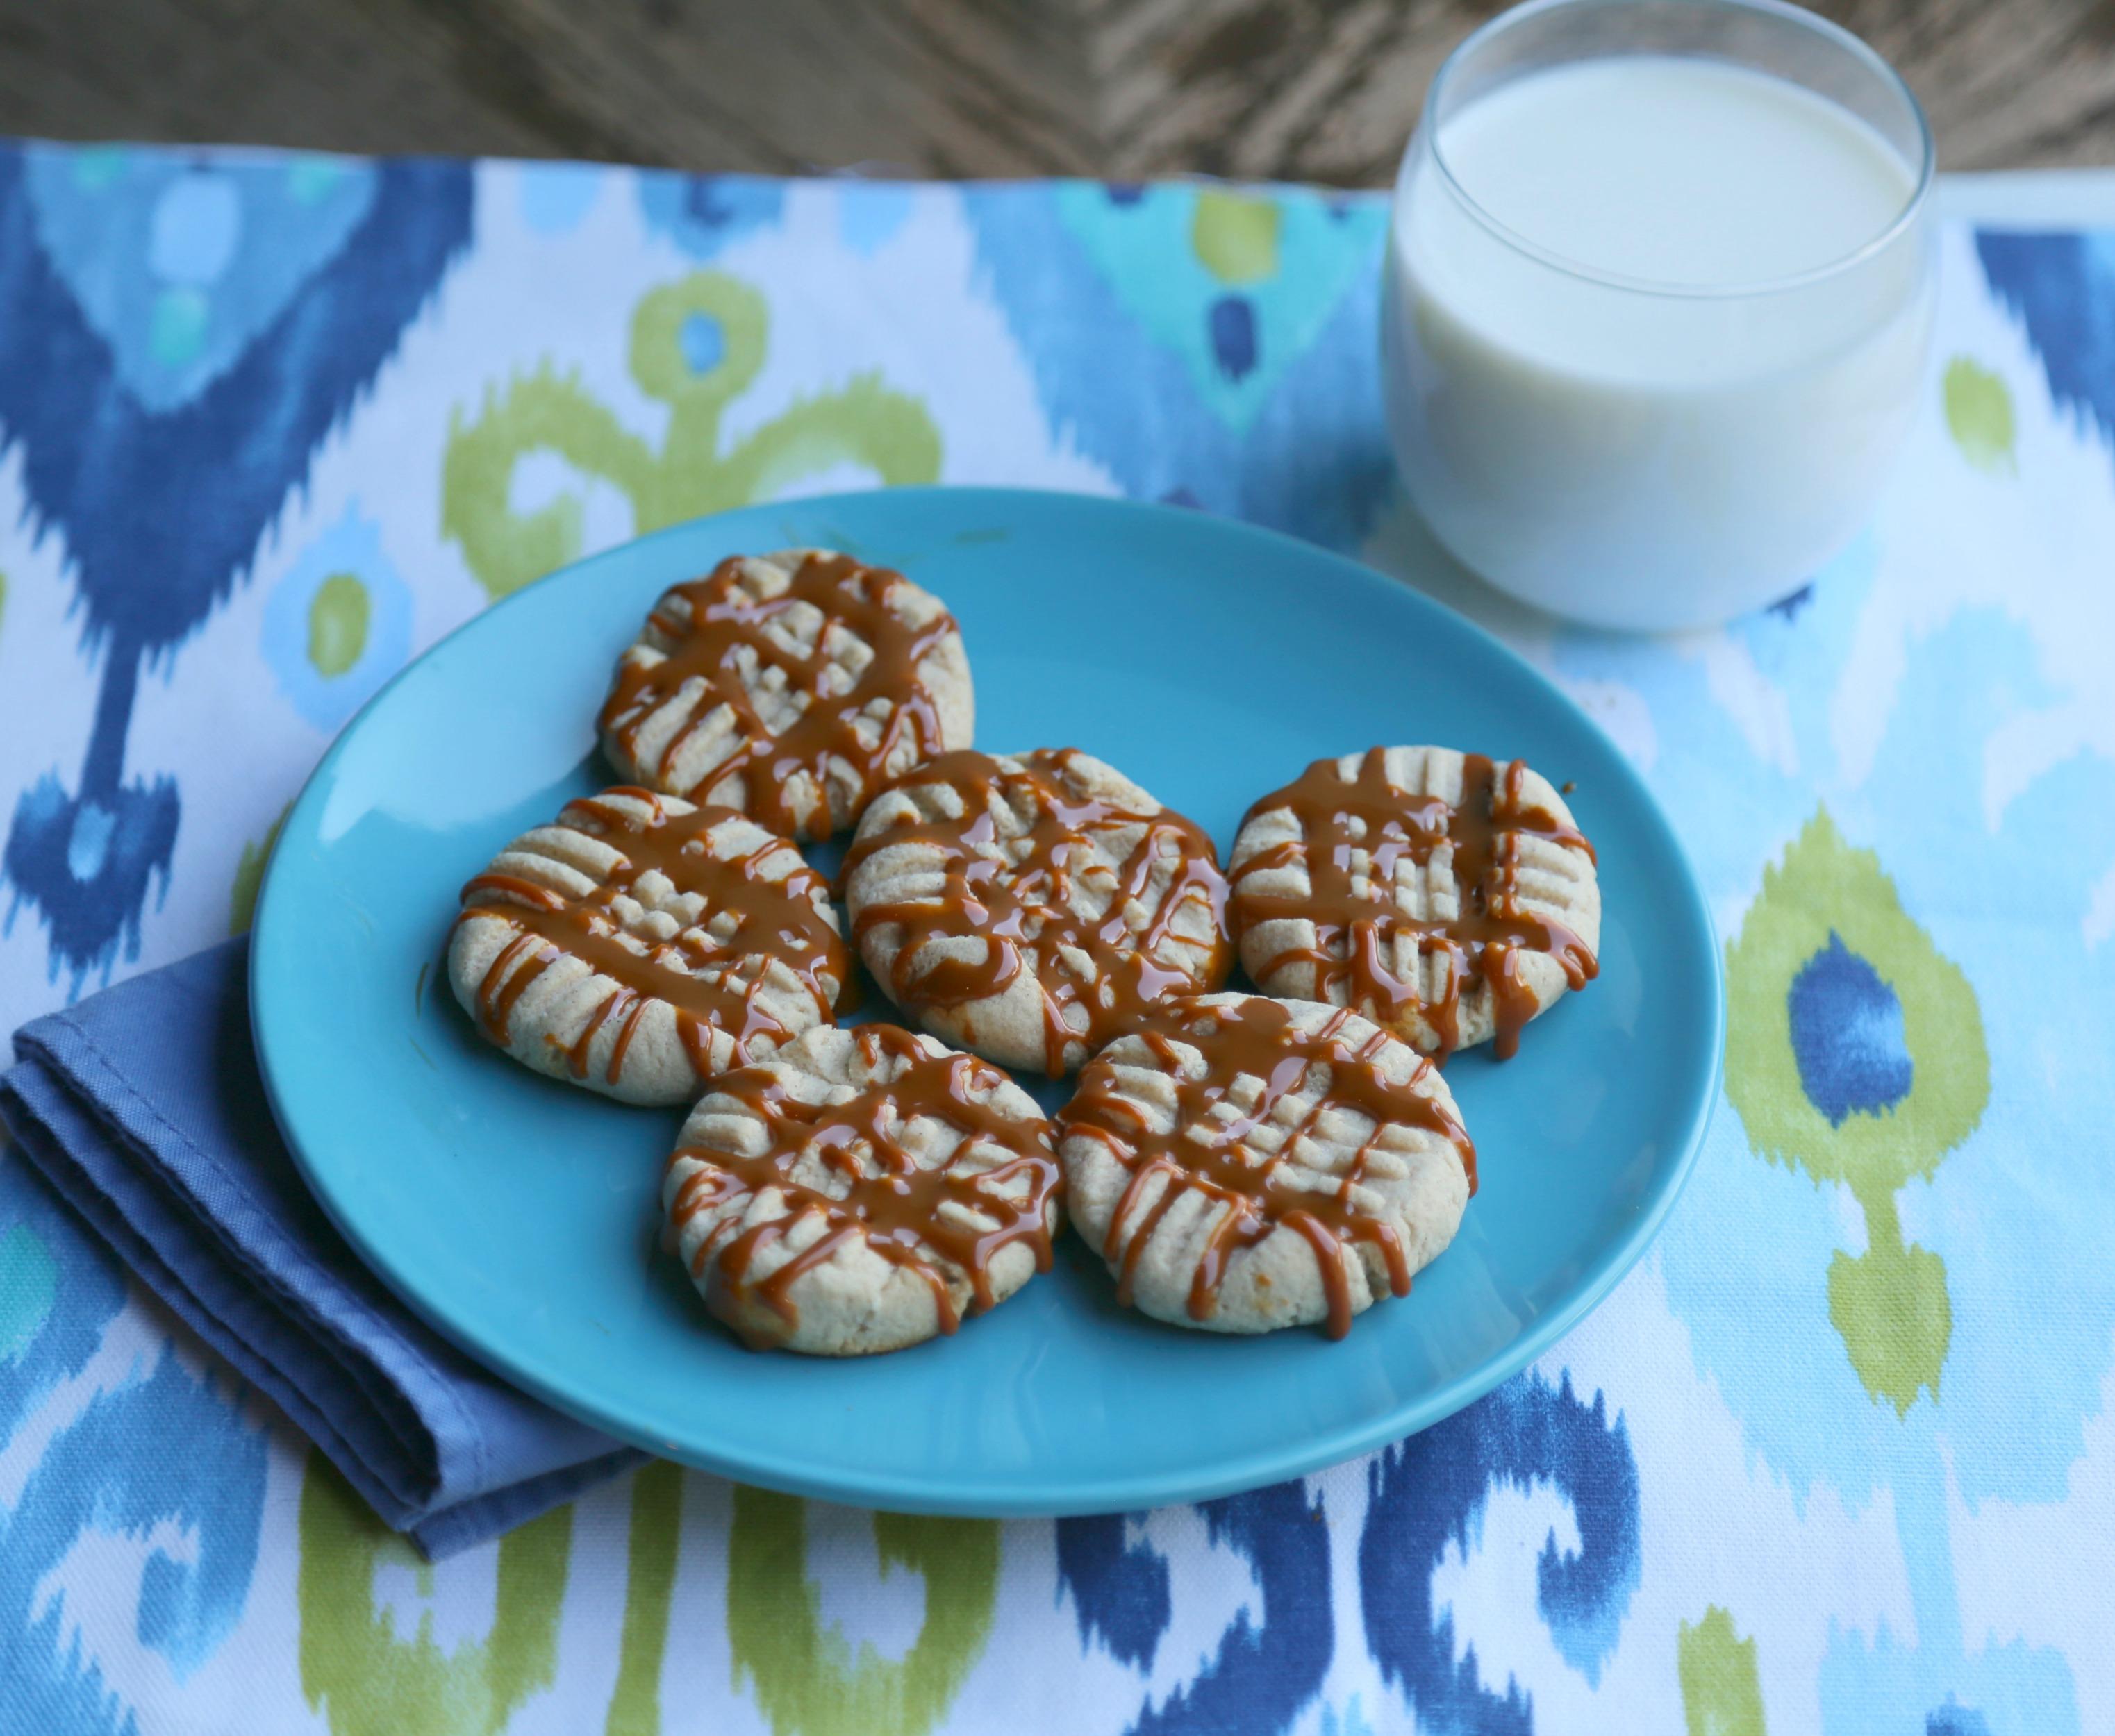 galletas-de-atole-atole-cookies-vianneyrodriguez-sweetlifebake